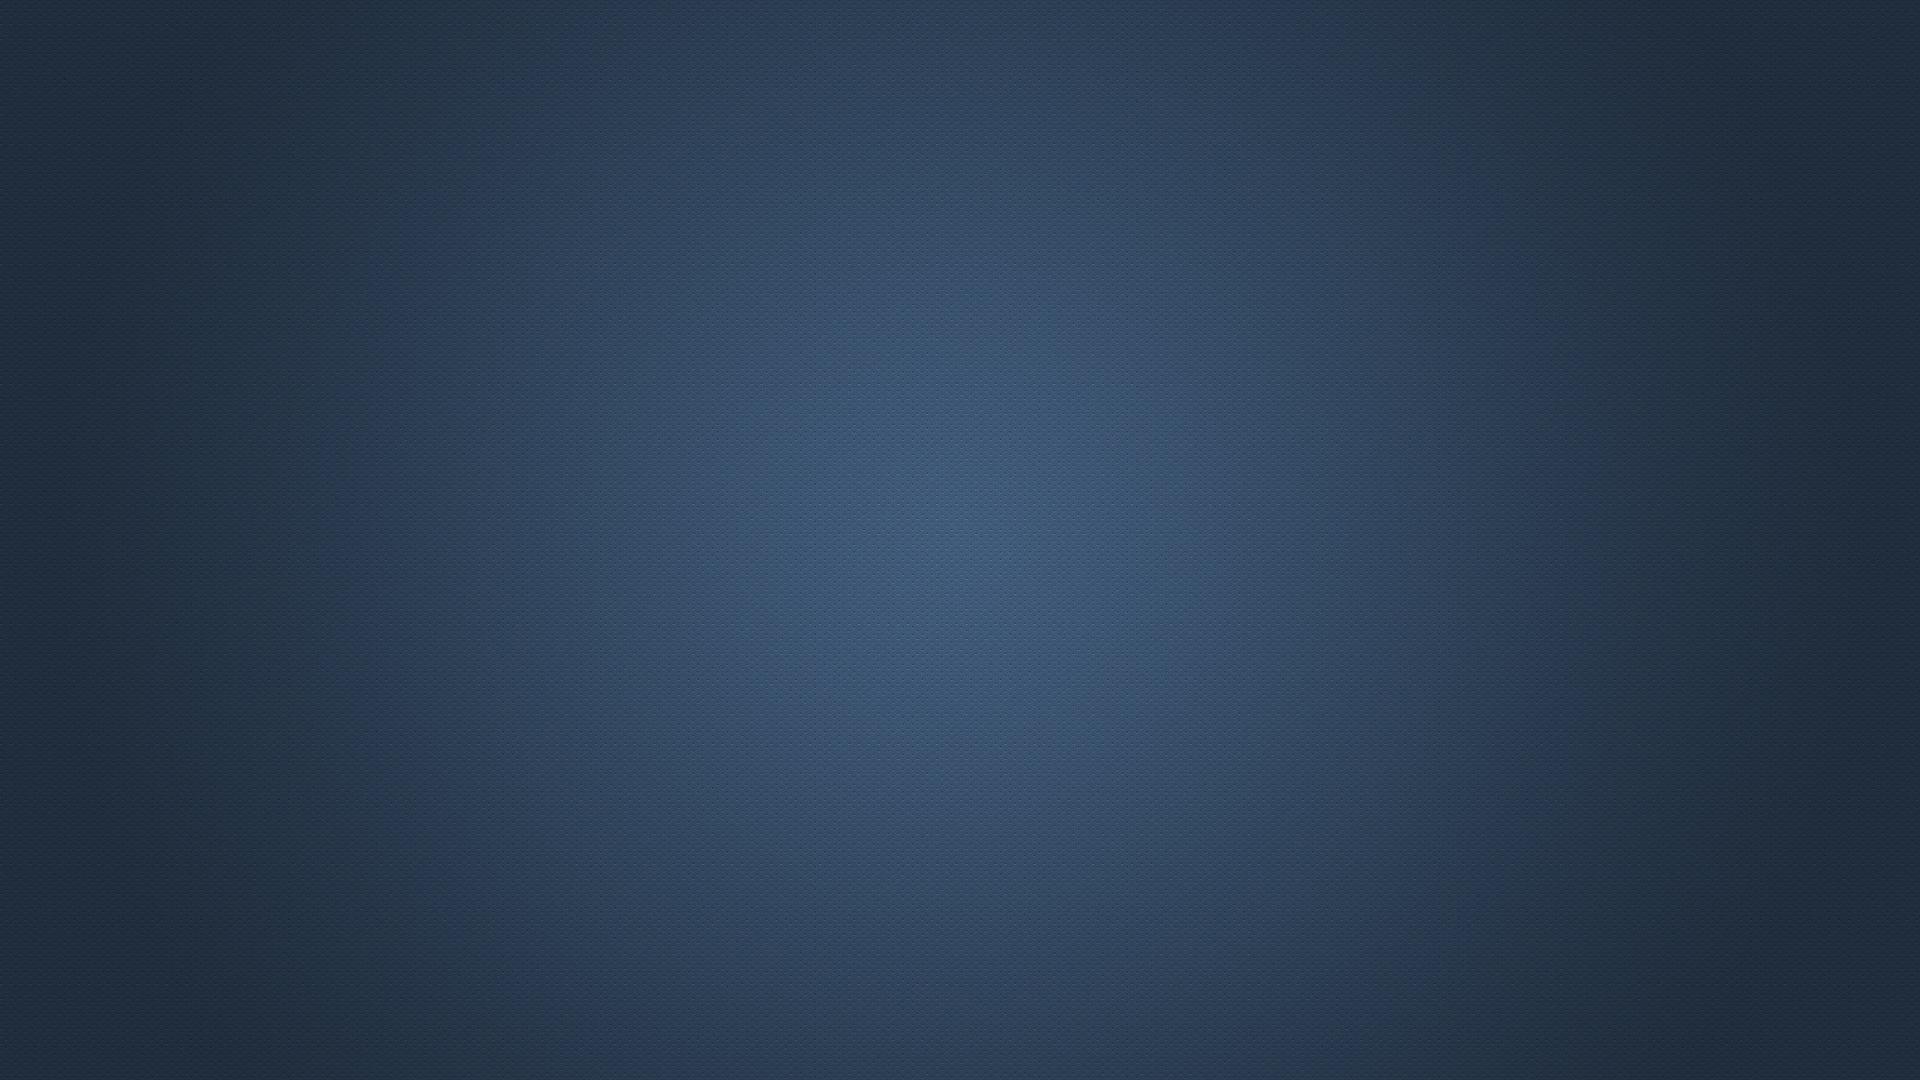 Free Dark Blue Wallpaper High Quality  PixelsTalkNet